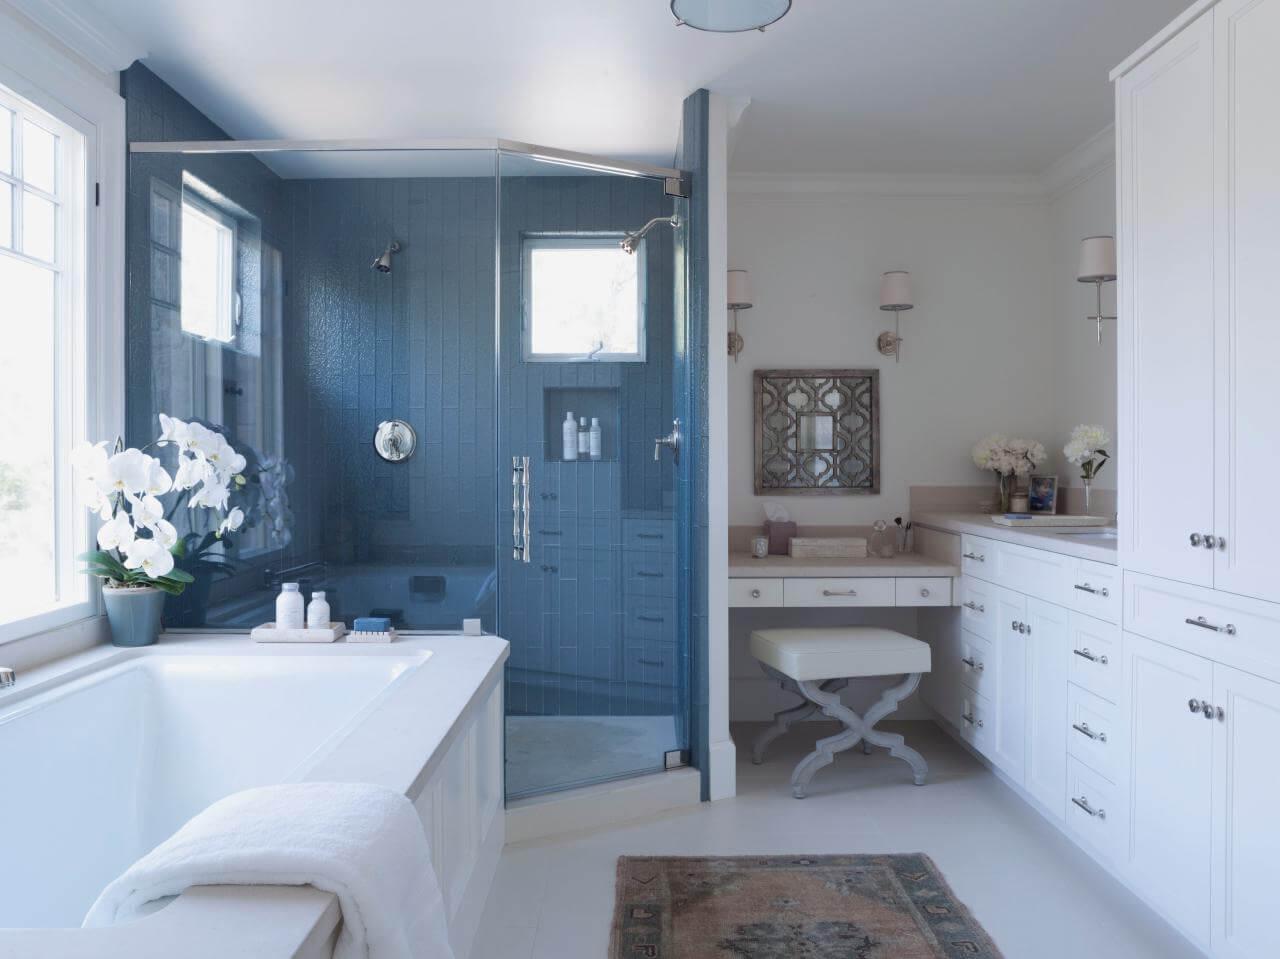 Bathroom remodeling made easy